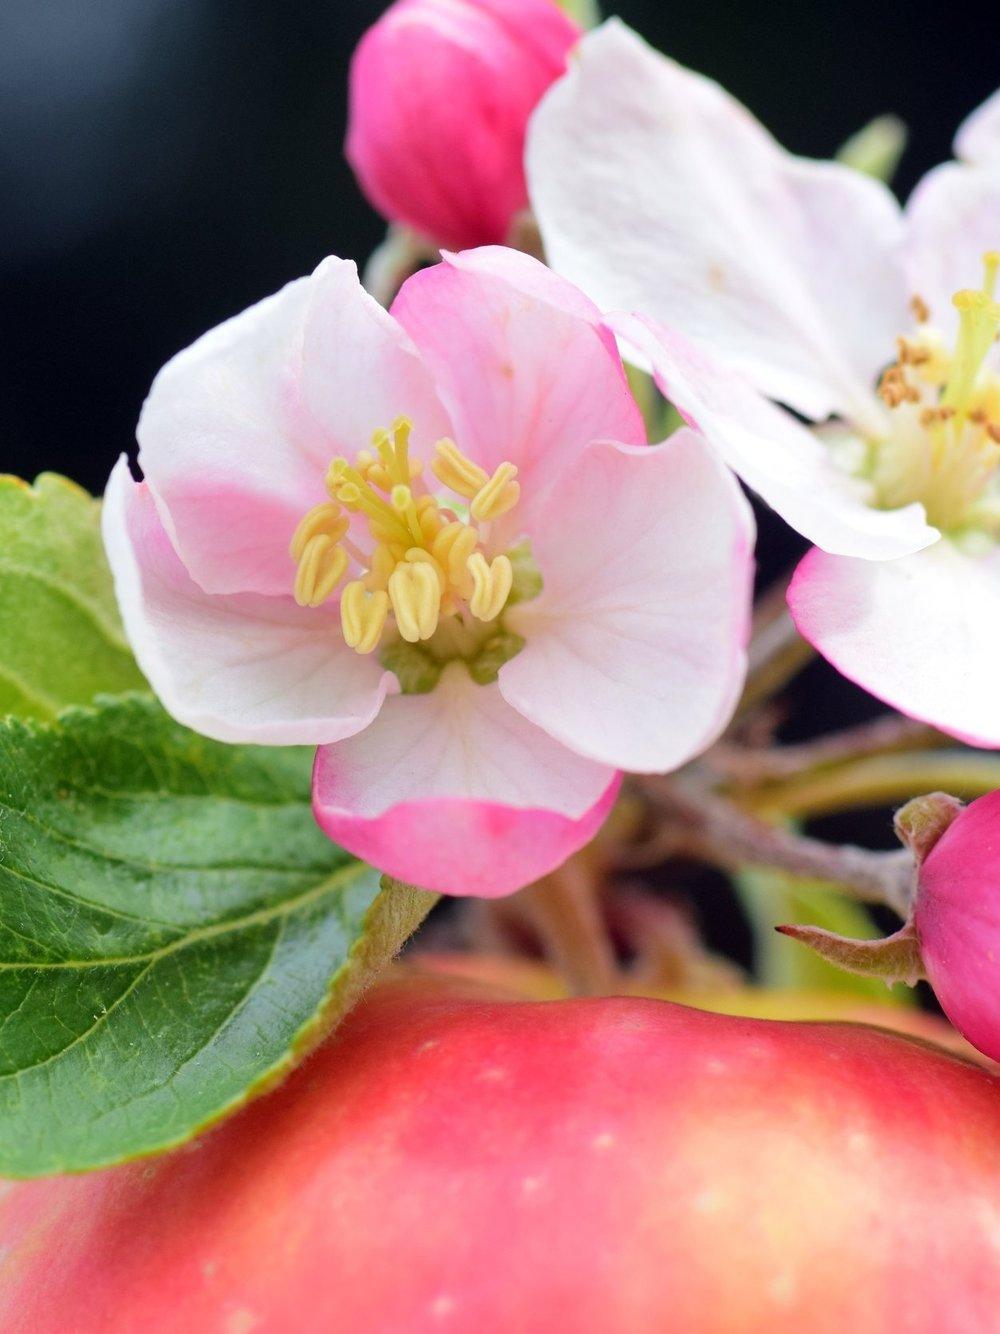 apple-2274007.jpg